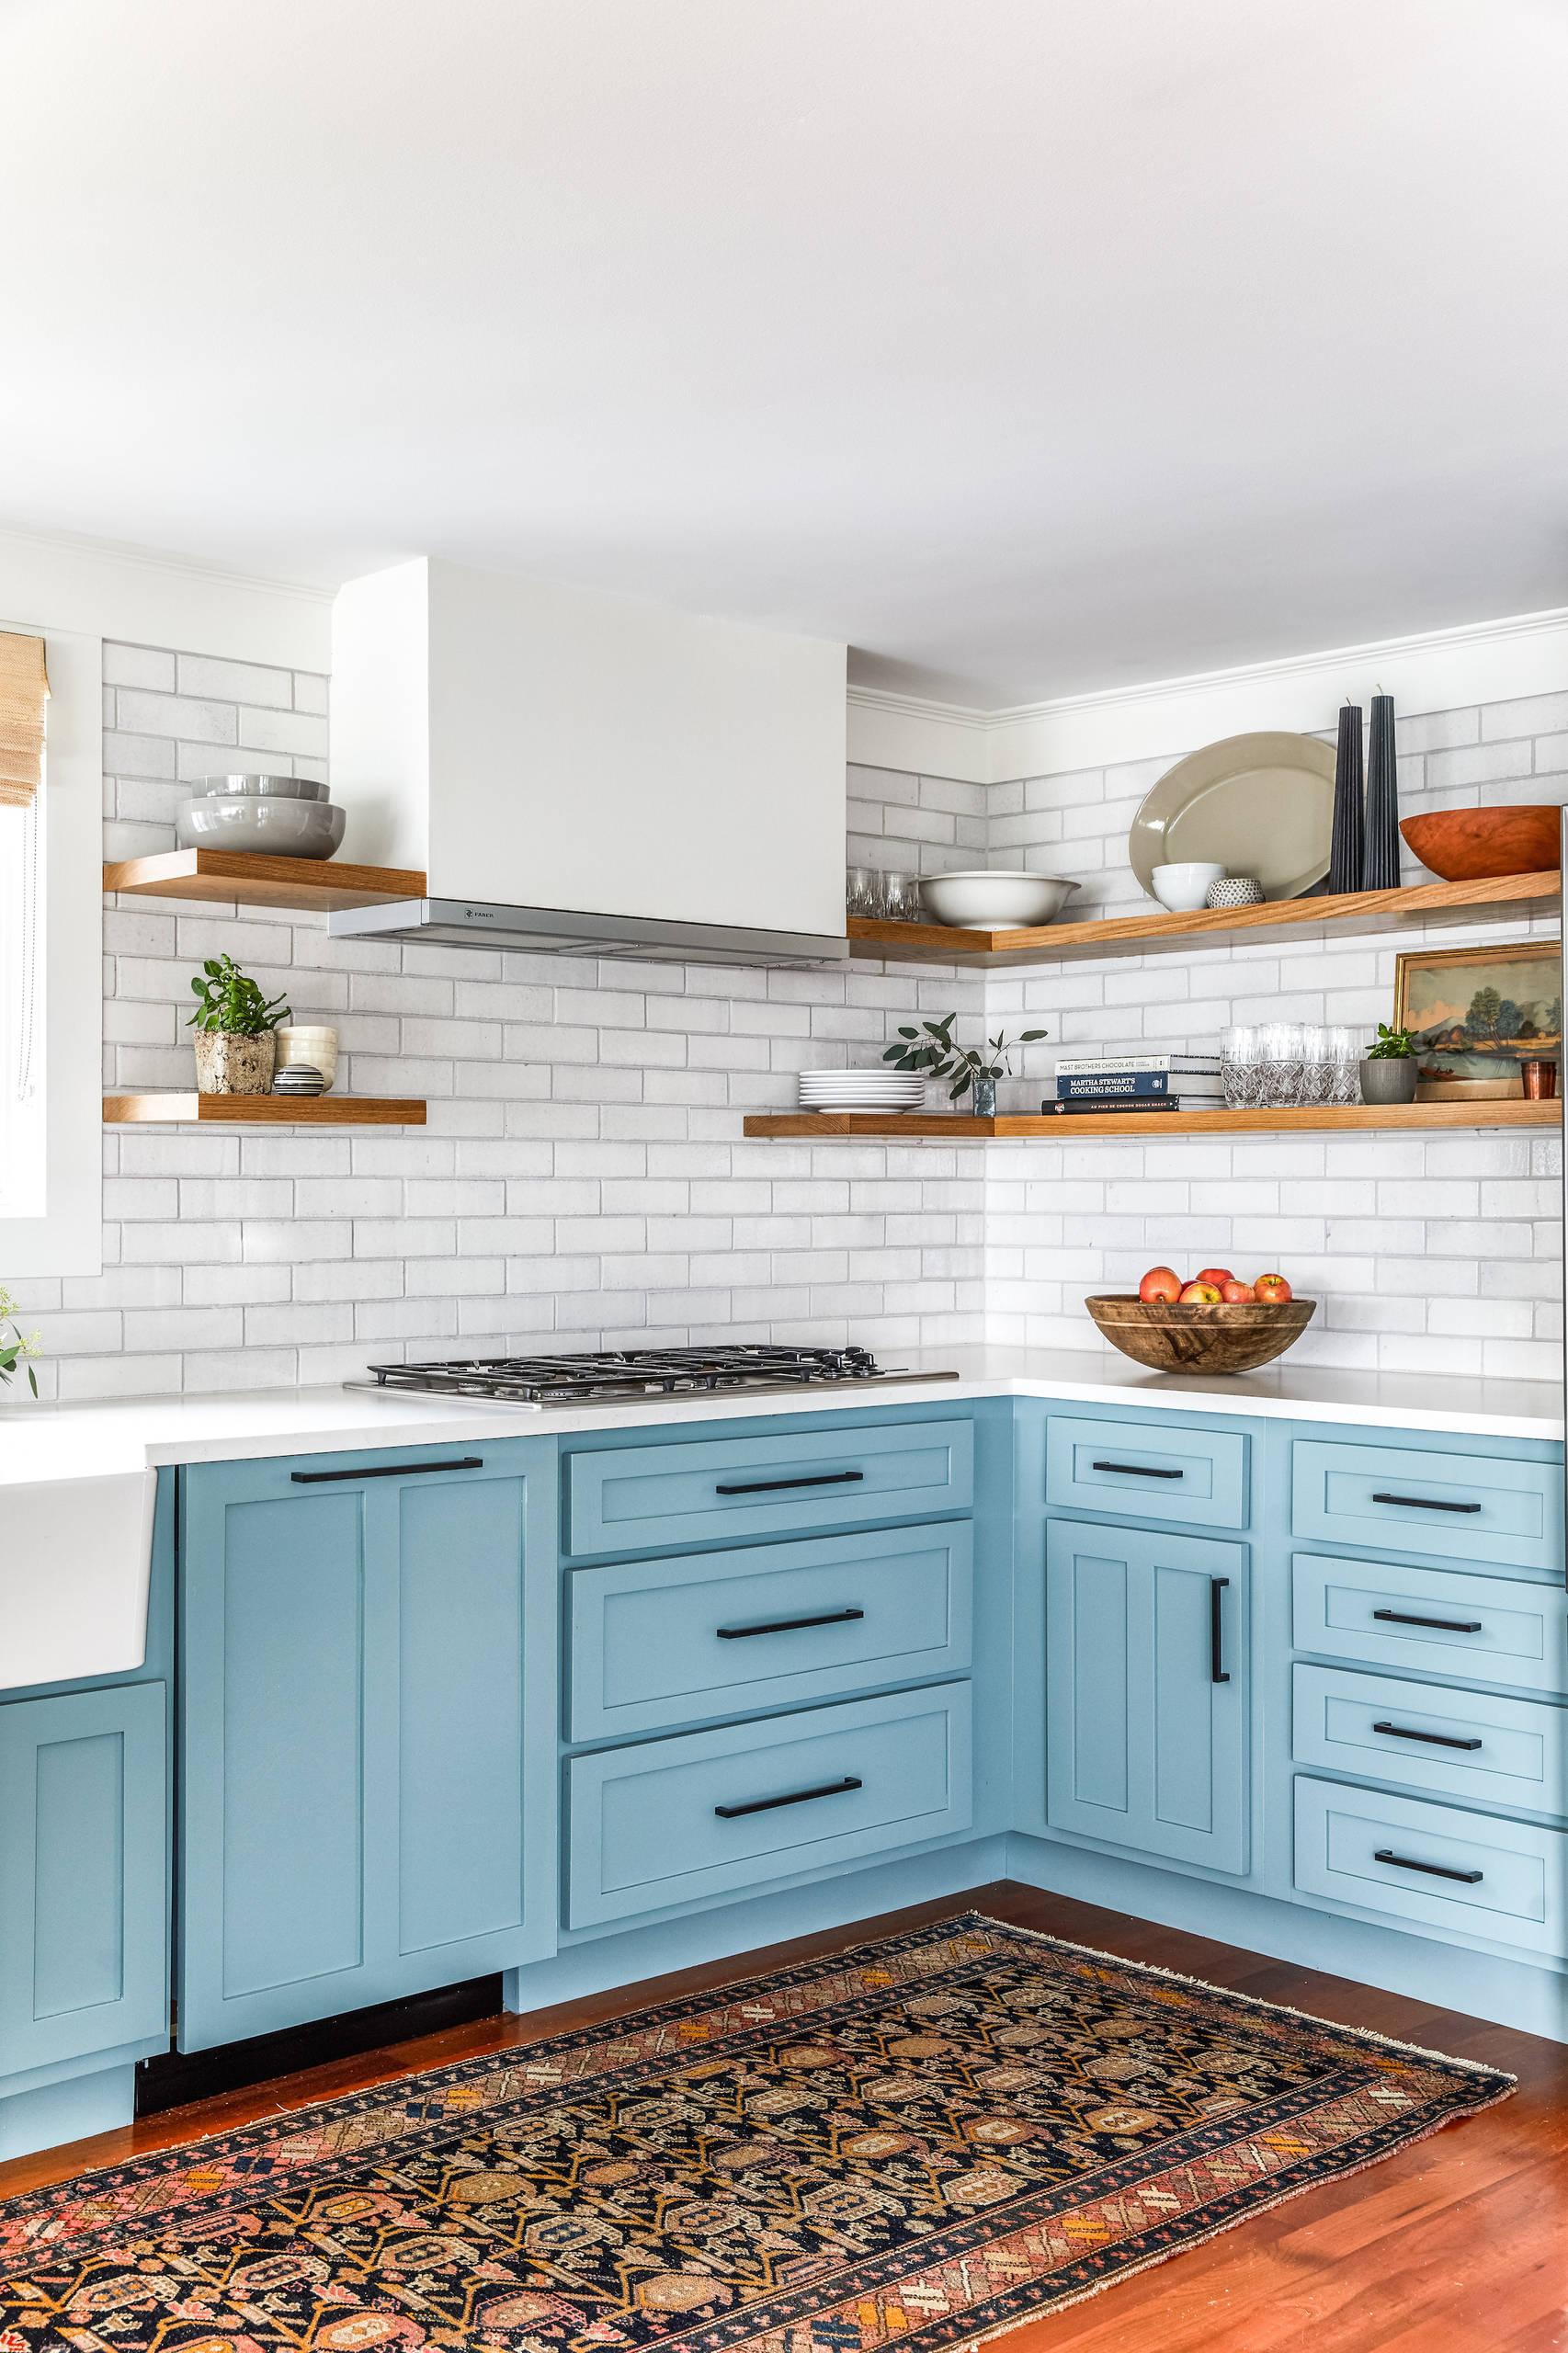 75 Beautiful Farmhouse Kitchen With Brick Backsplash Pictures Ideas May 2021 Houzz